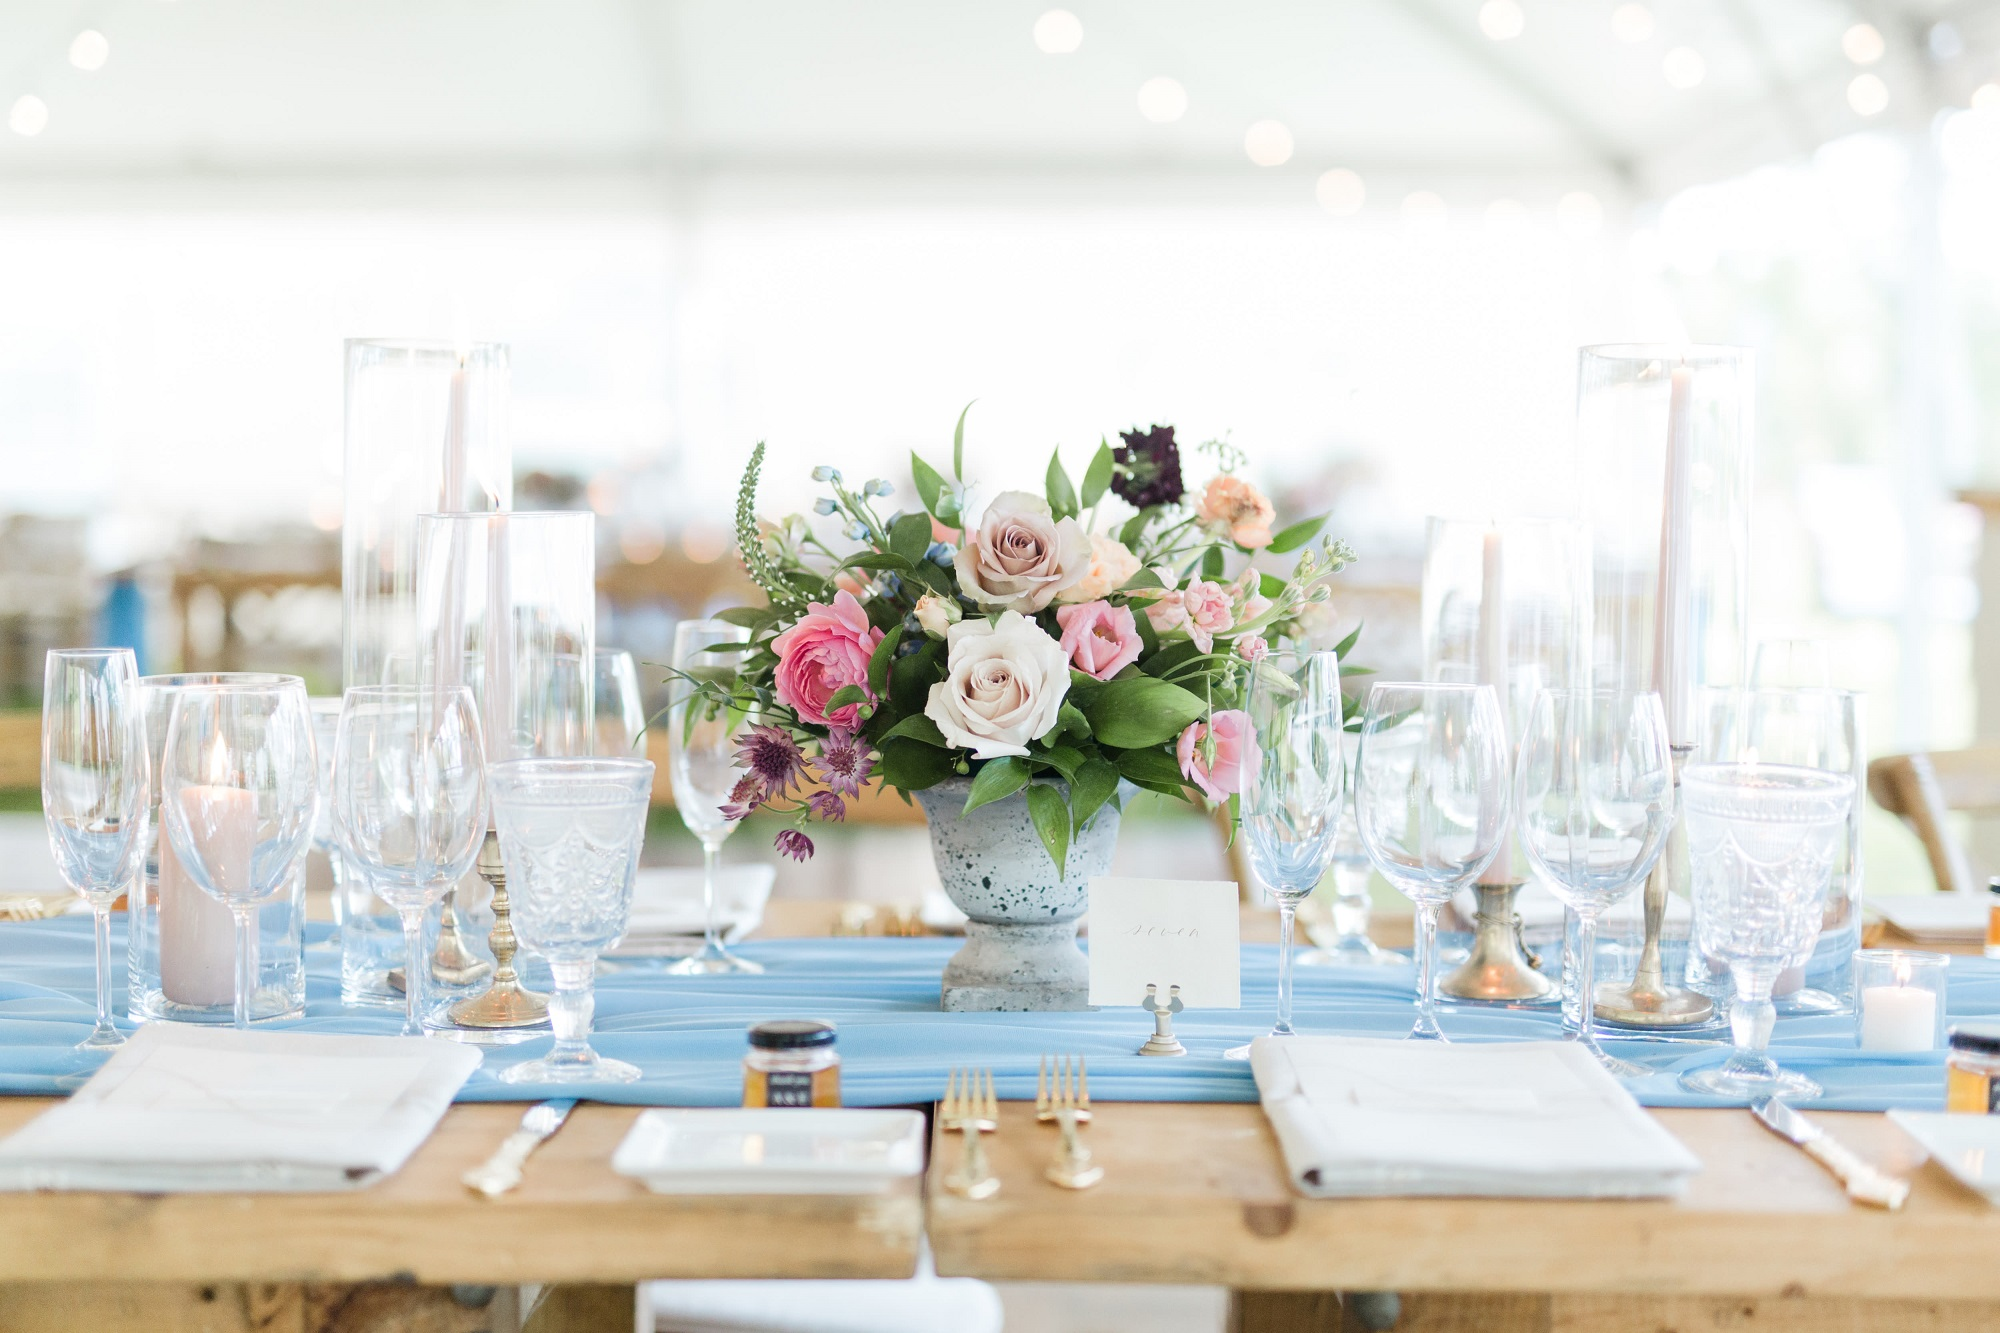 niagara_wedding_planner_kj_and_co11.jpg